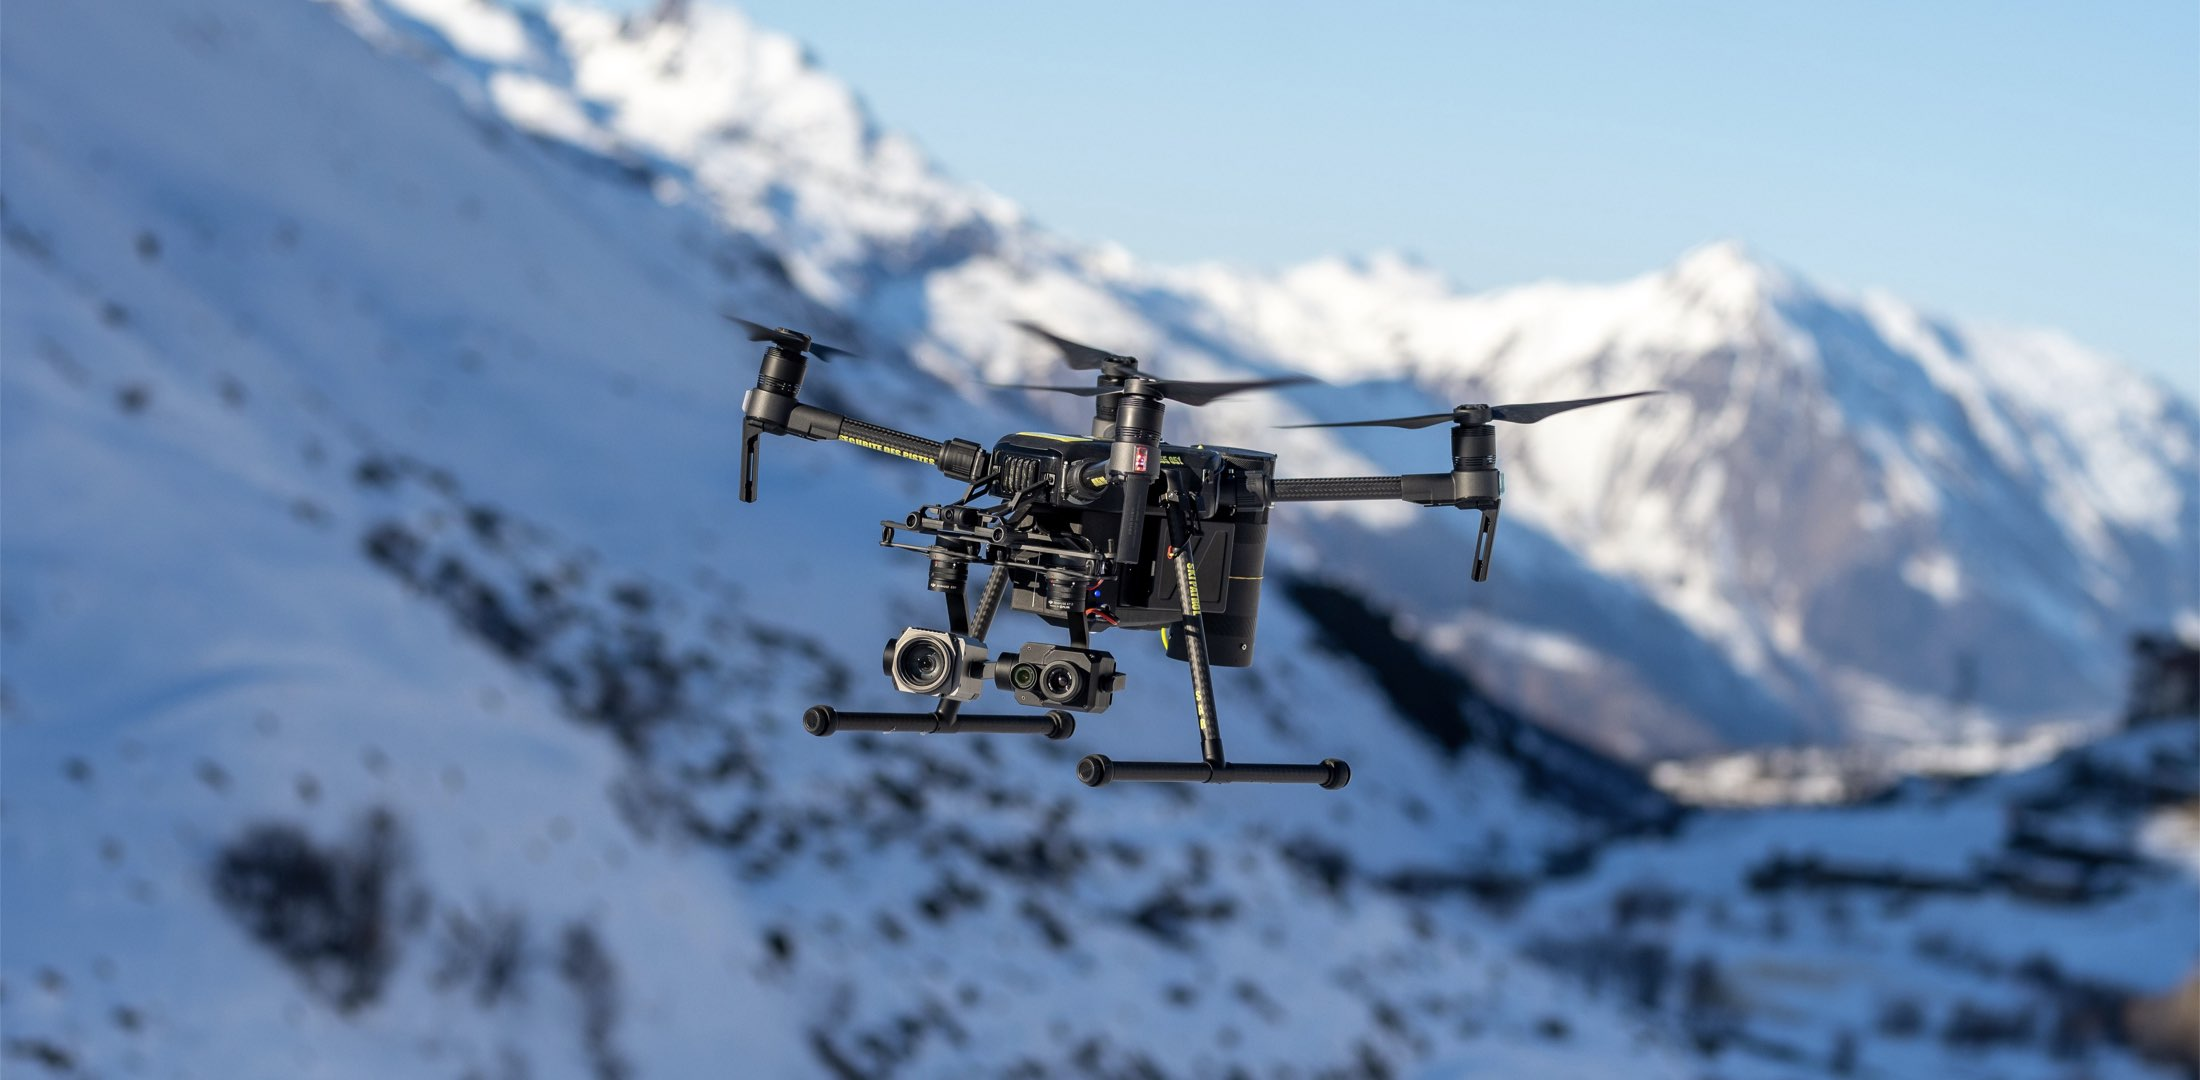 Matrice 210 Drone Scouting ValThorens.001